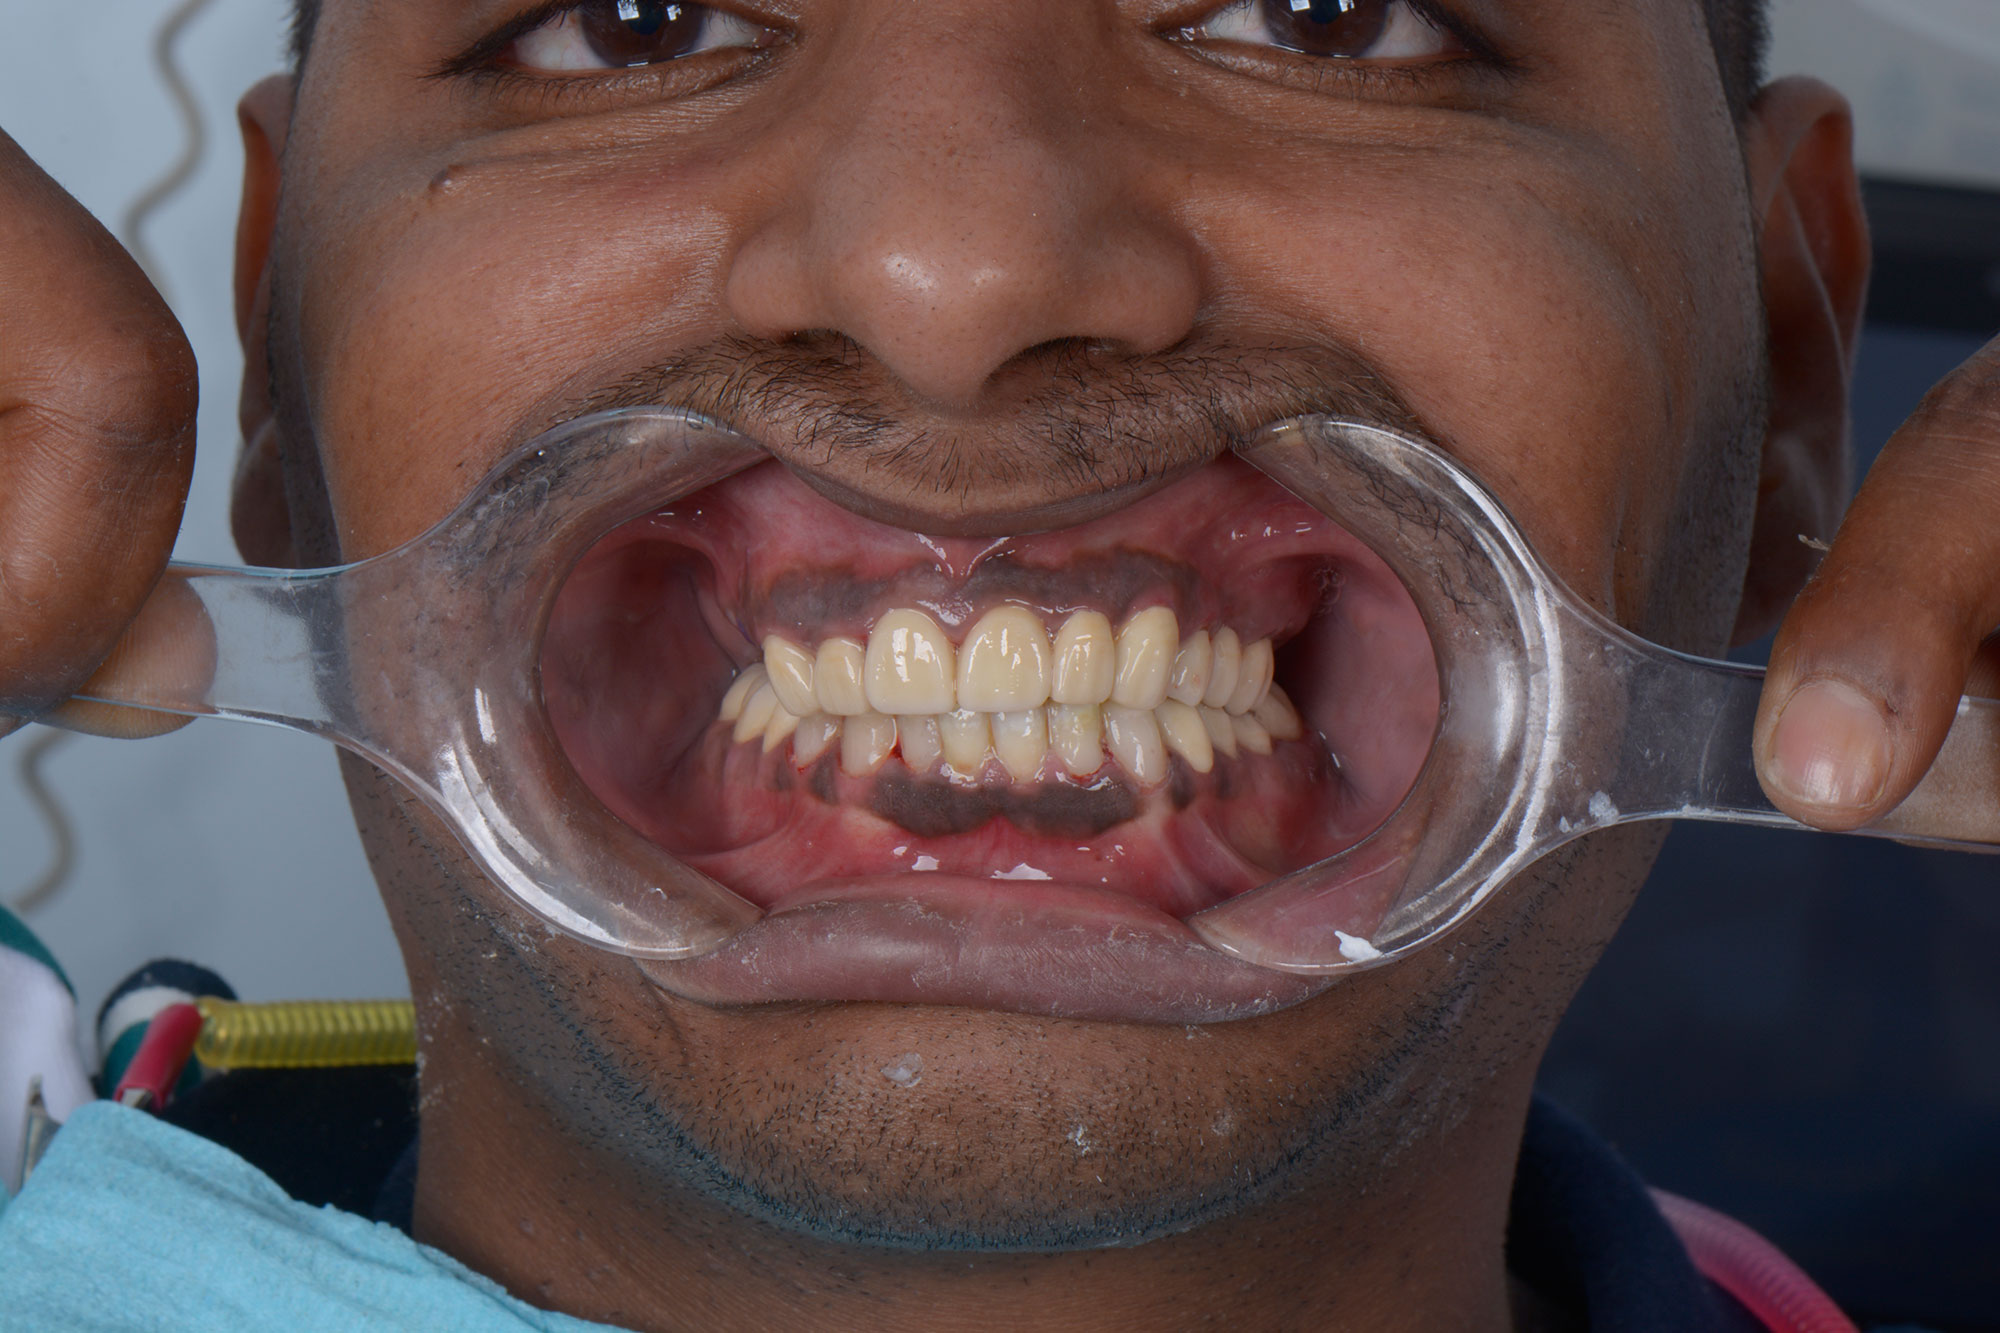 Case Study 7 - تسود وتهدم الاسنان والضروس